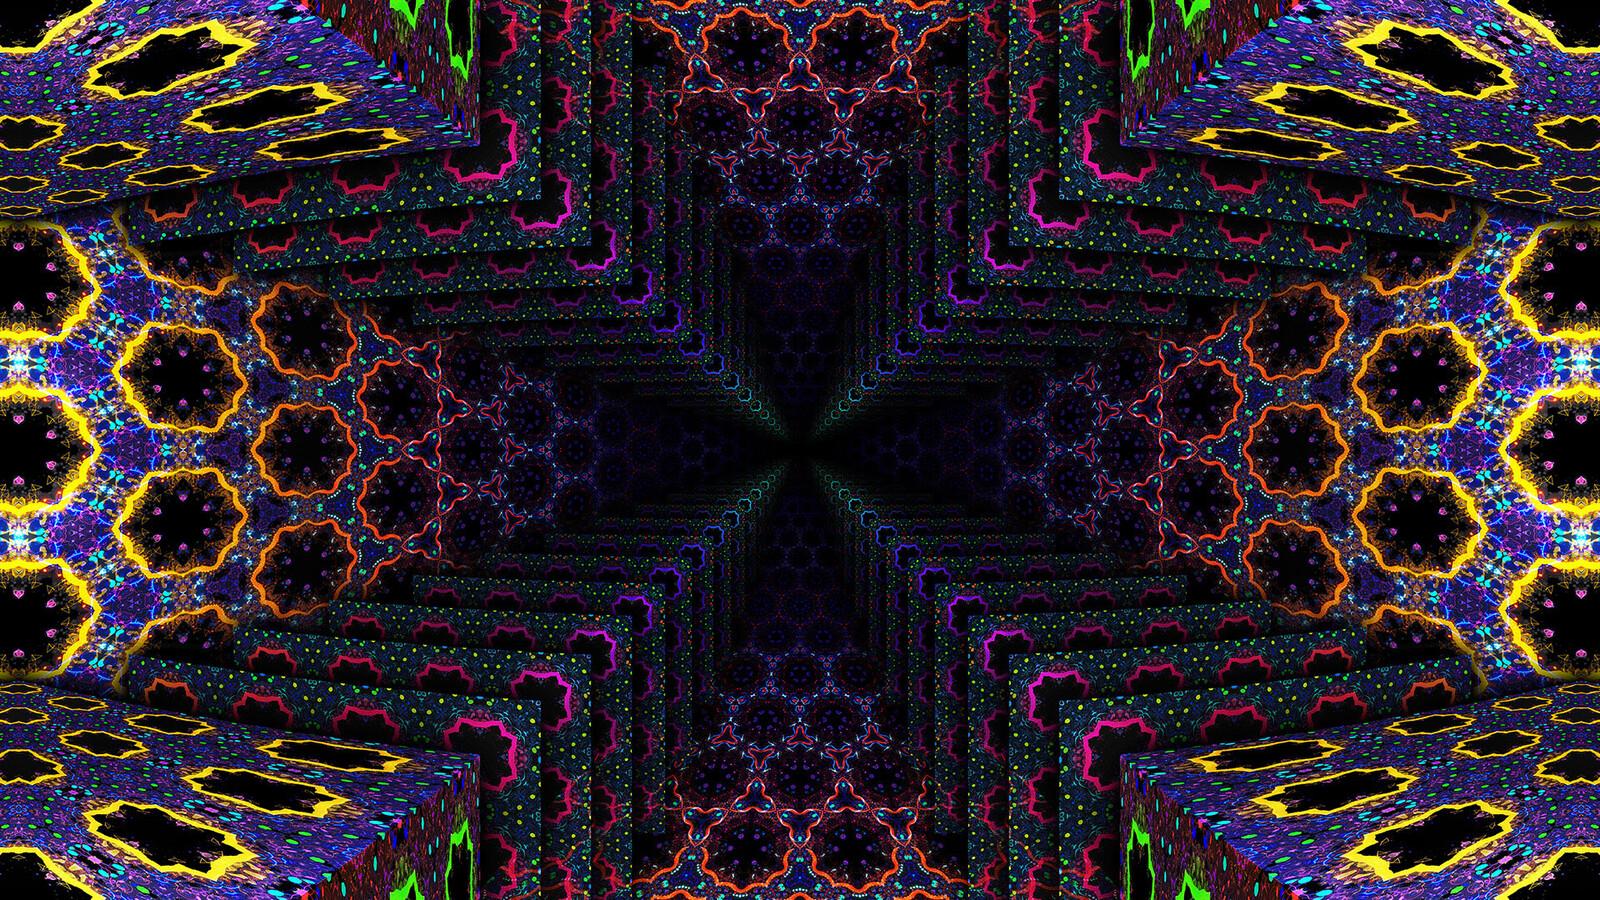 Desktop Wallpaper Natural Warp © 2020